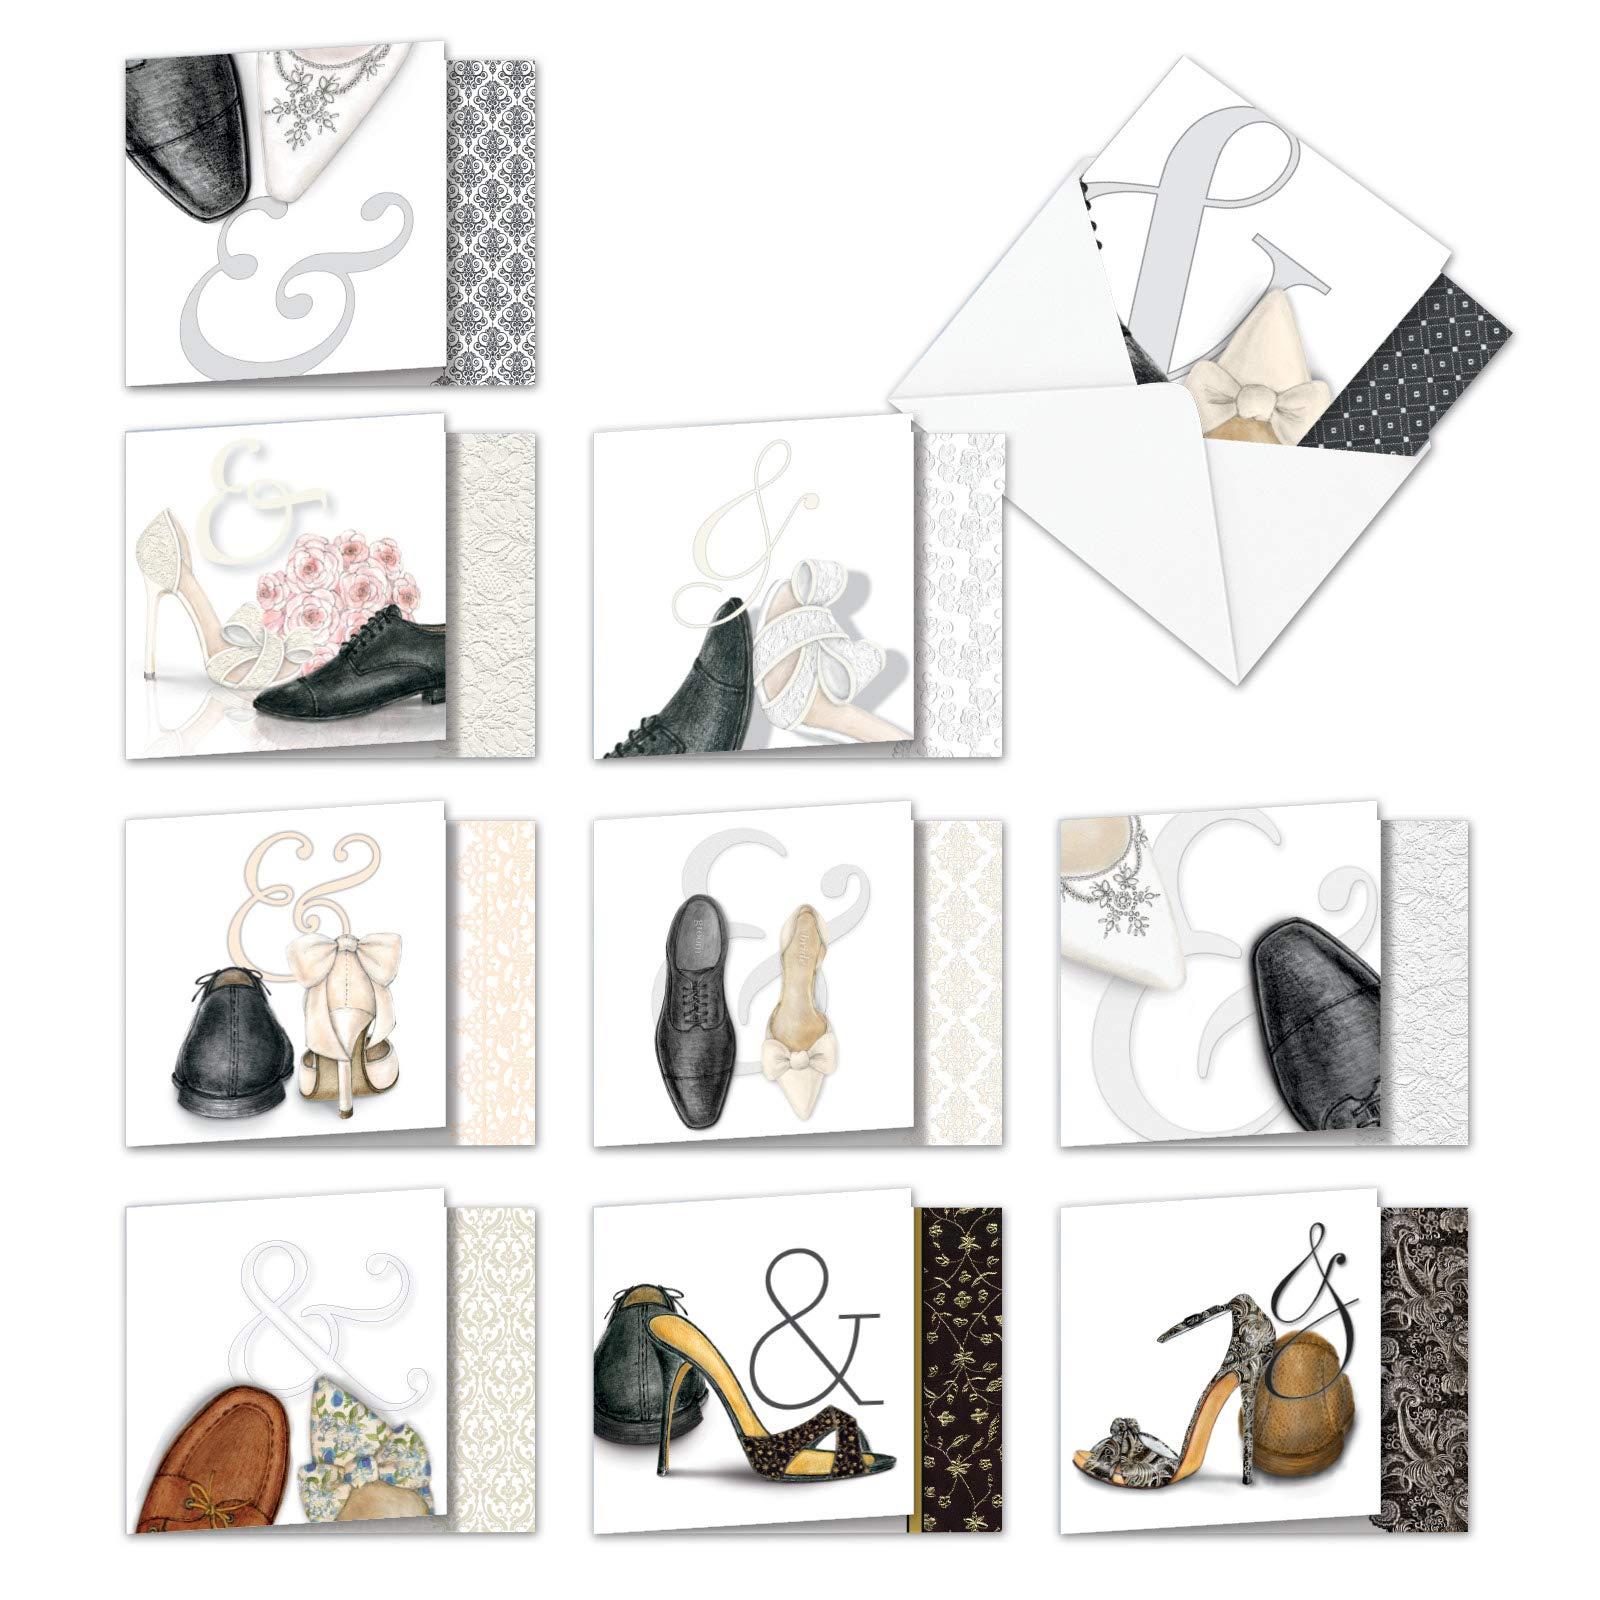 "AMQ5068WIG-B1x10 Sole Mates 婚礼邀请函:一套 10 张""正方形""贺卡,特色男女结婚鞋配对生命,信封(10 种设计,尺寸:10.16 x 12.7 厘米)"